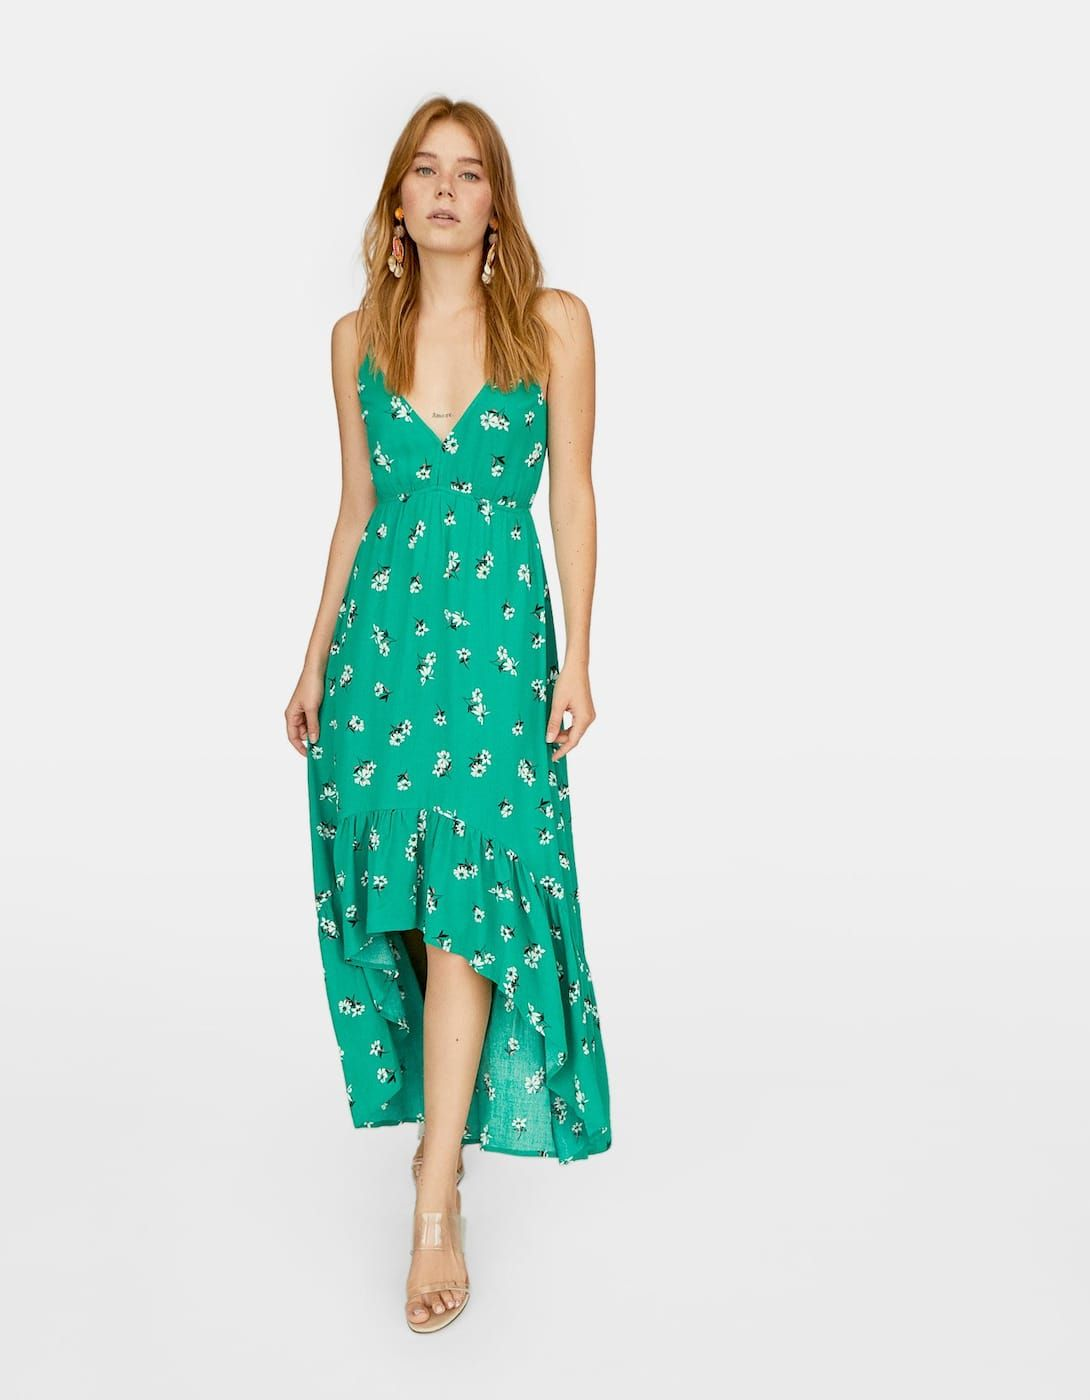 Ruffled Strappy Dress Just In Stradivarius United Kingdom Strappy Dresses Dresses Ruffle Dress [ 1400 x 1090 Pixel ]